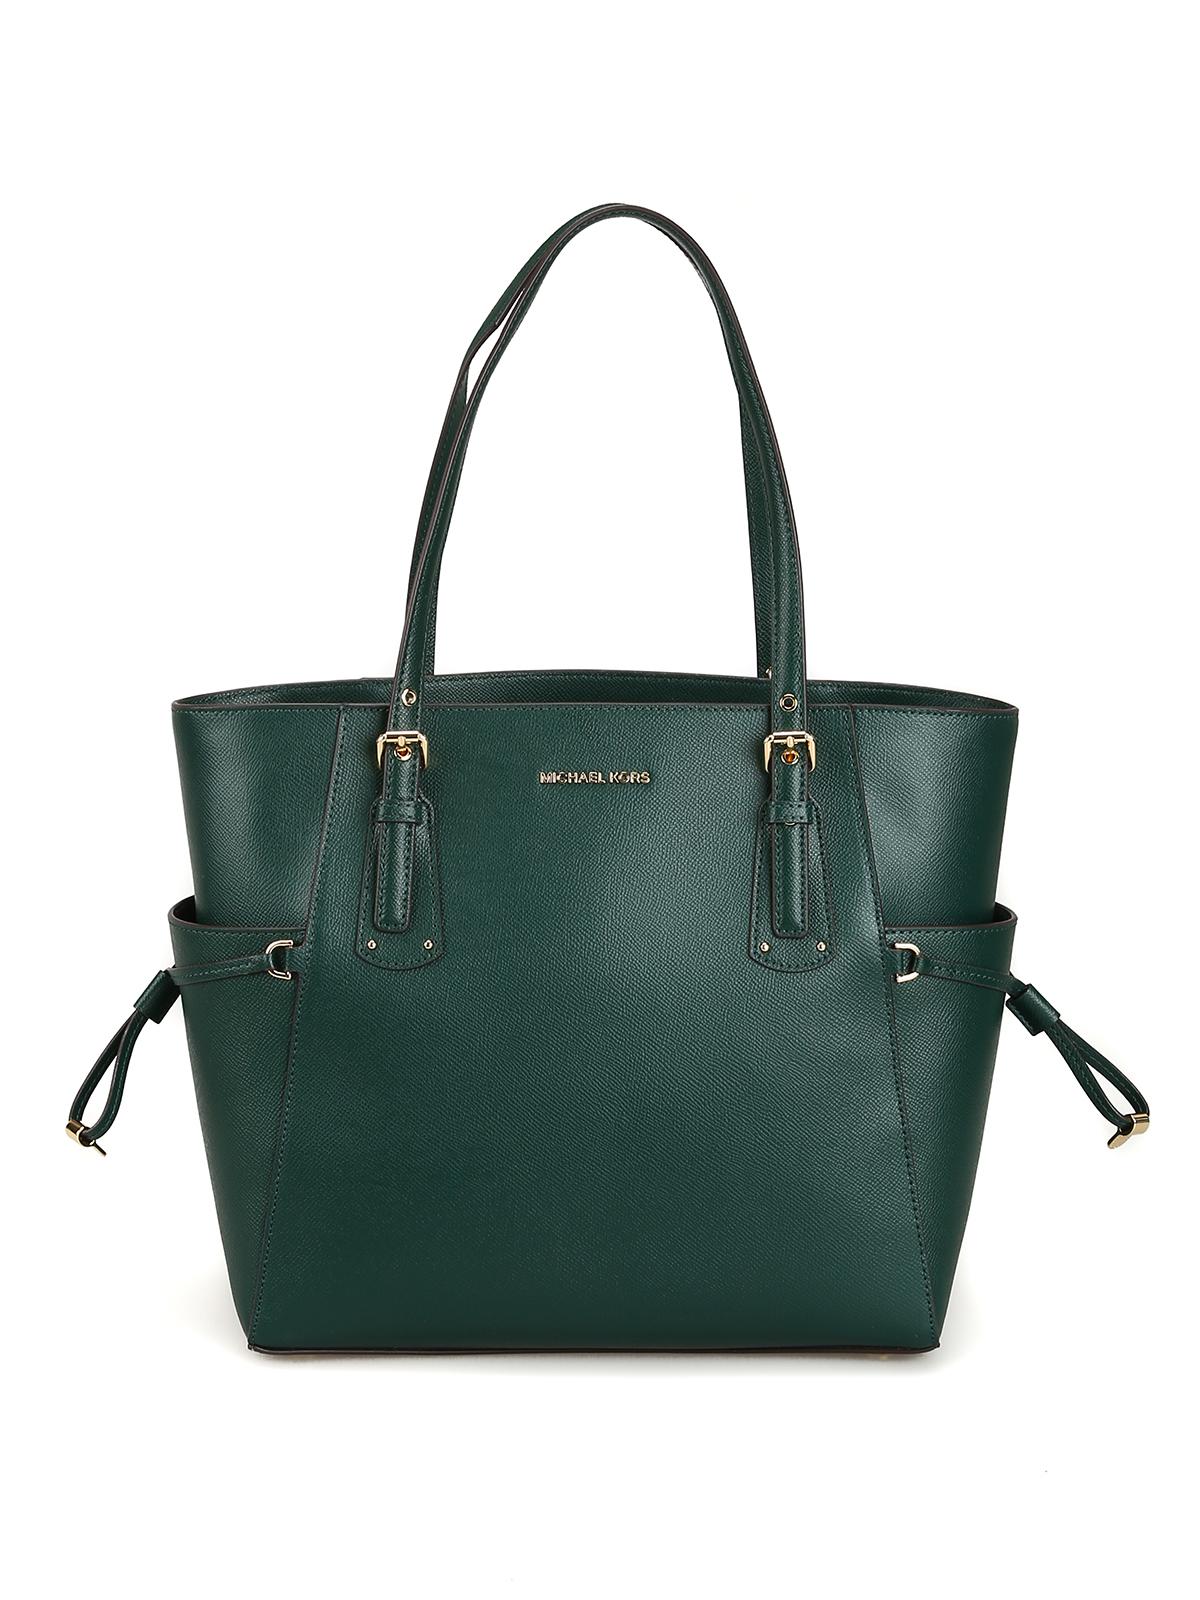 c20da686fa4d1f Michael Kors - Voyager S dark green grainy leather bag - totes bags ...